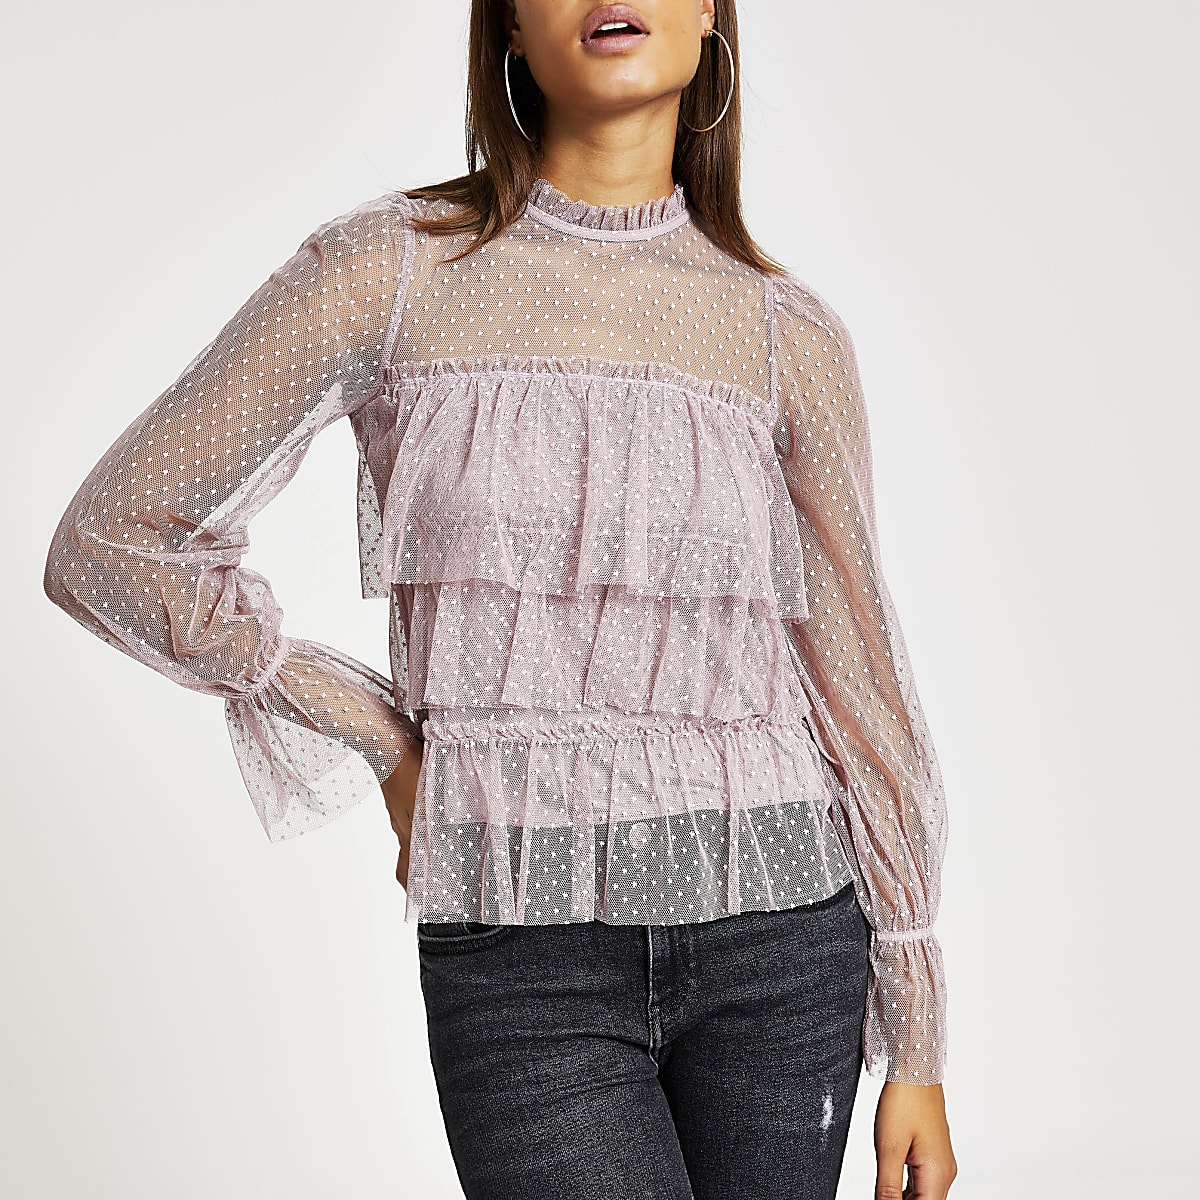 Purple polka dot sheer long sleeve frill top